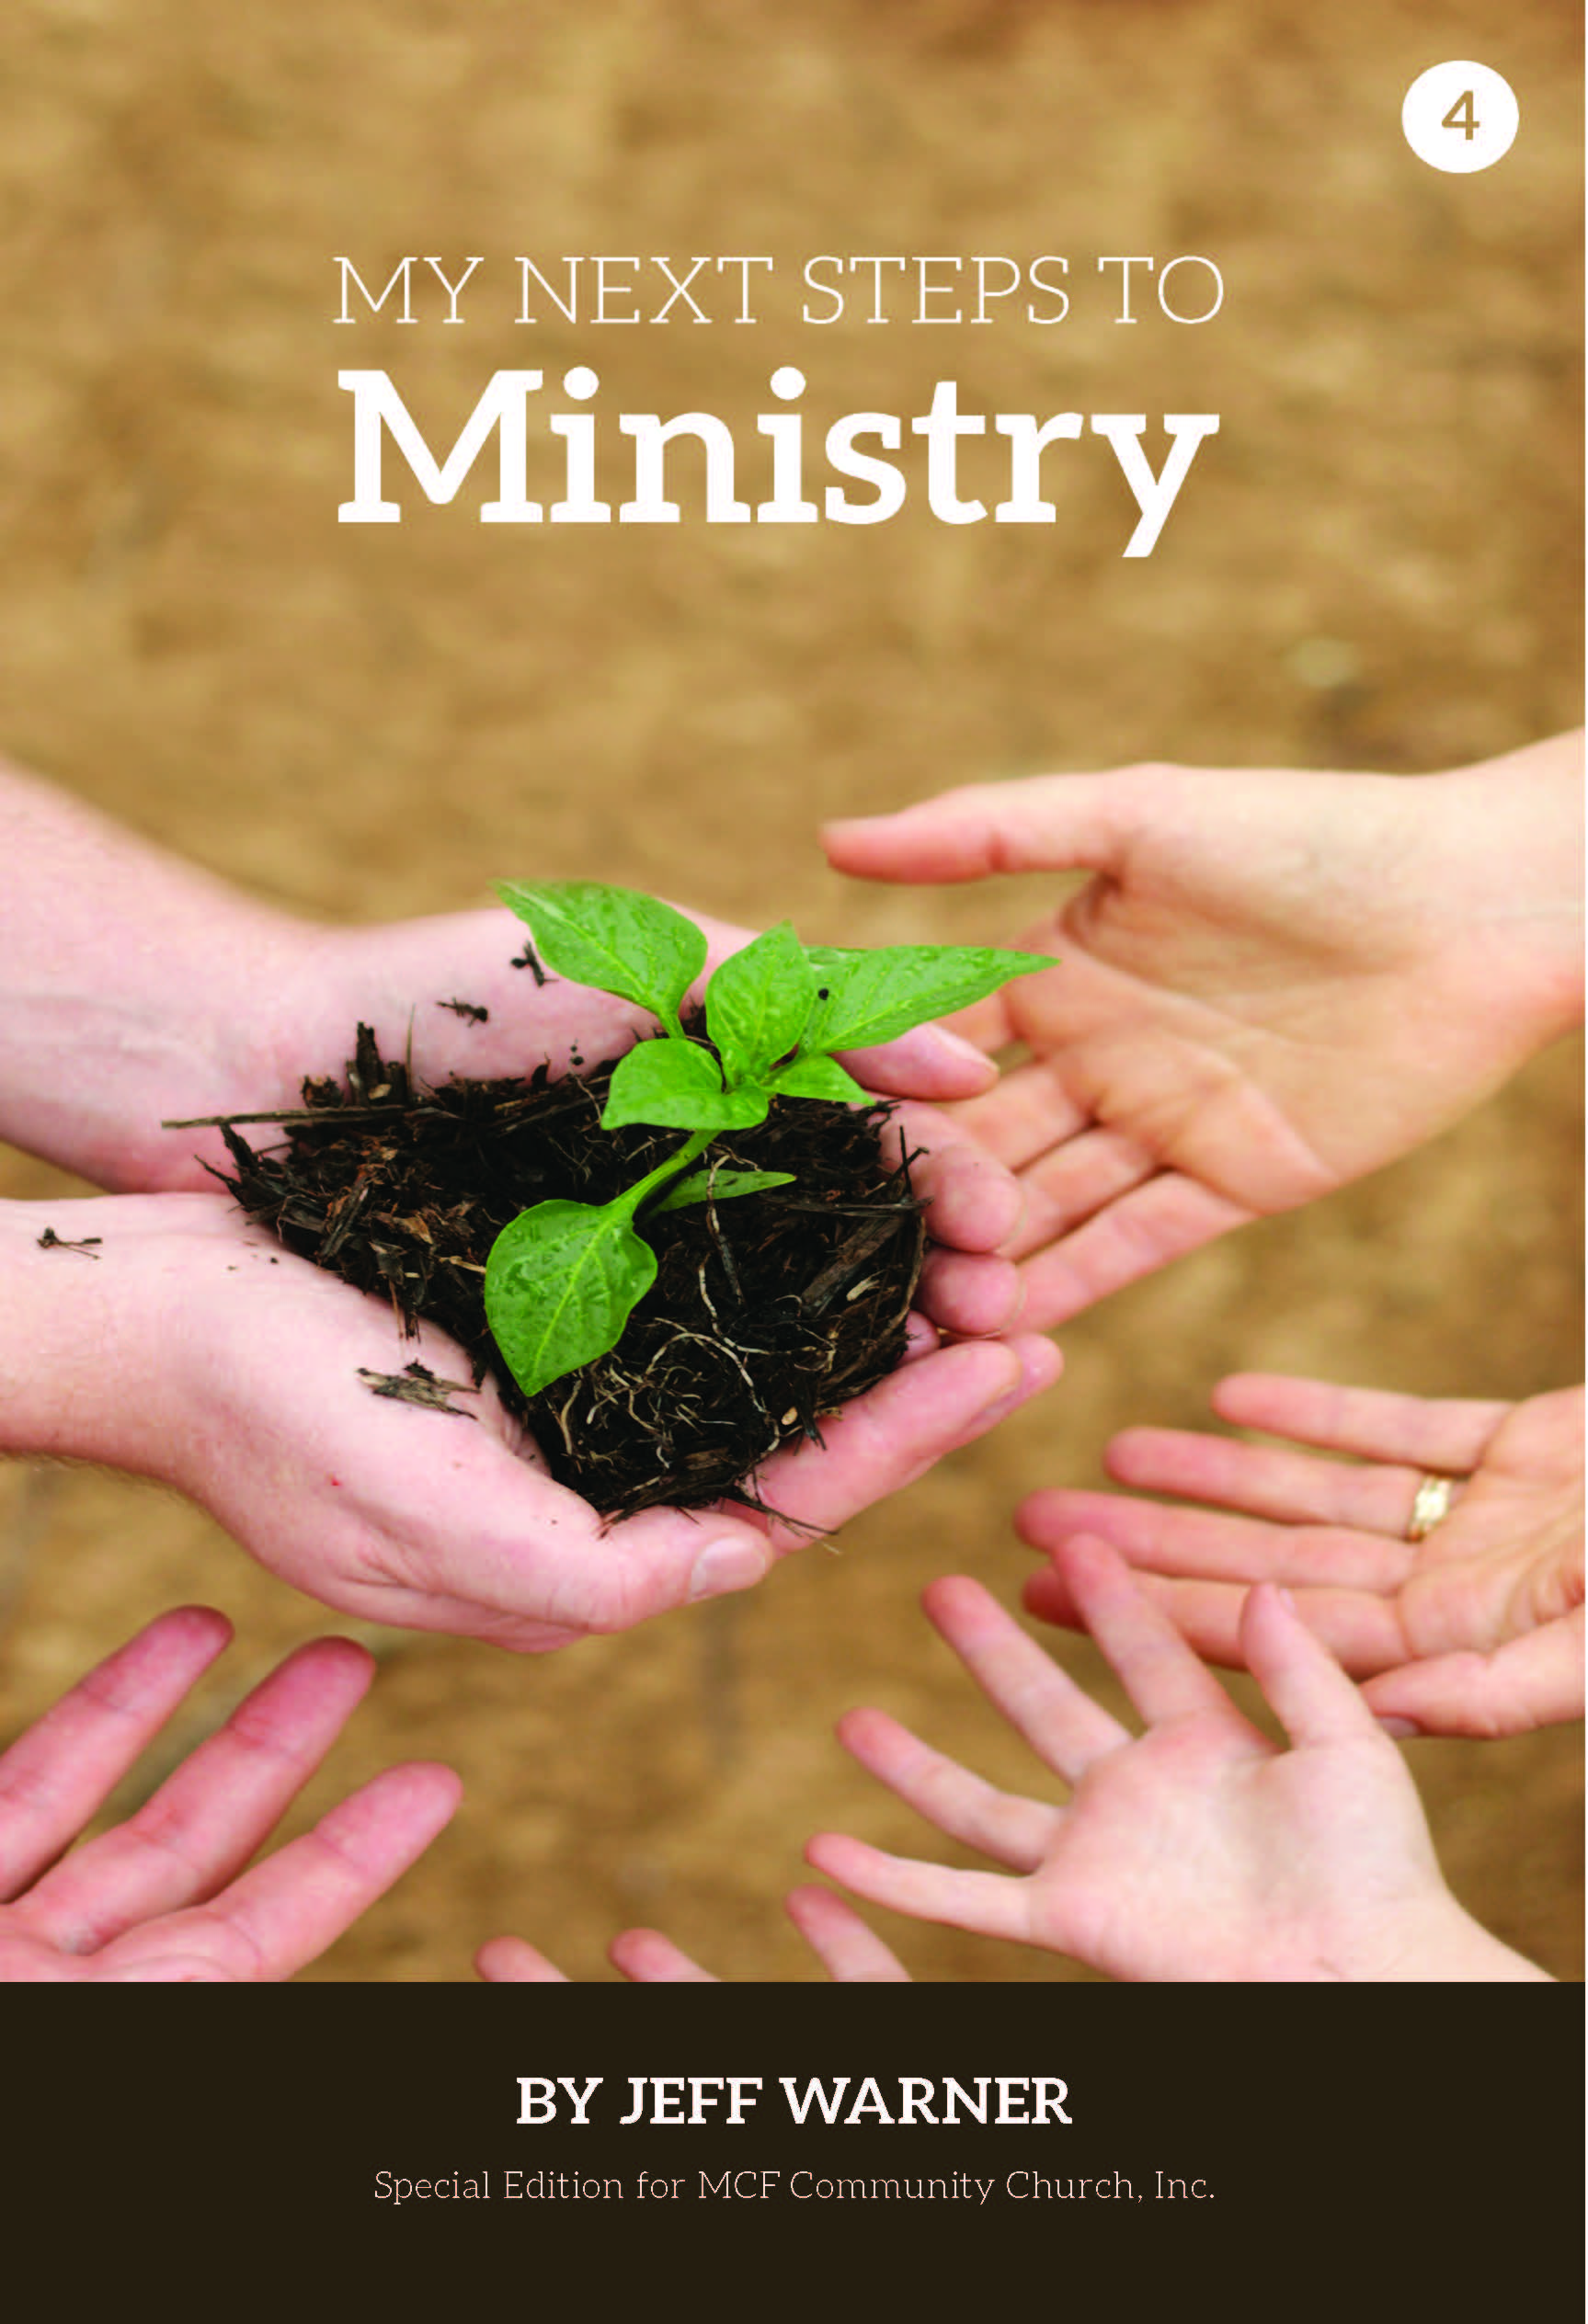 4-Ministry Cover-6Aug14.jpg